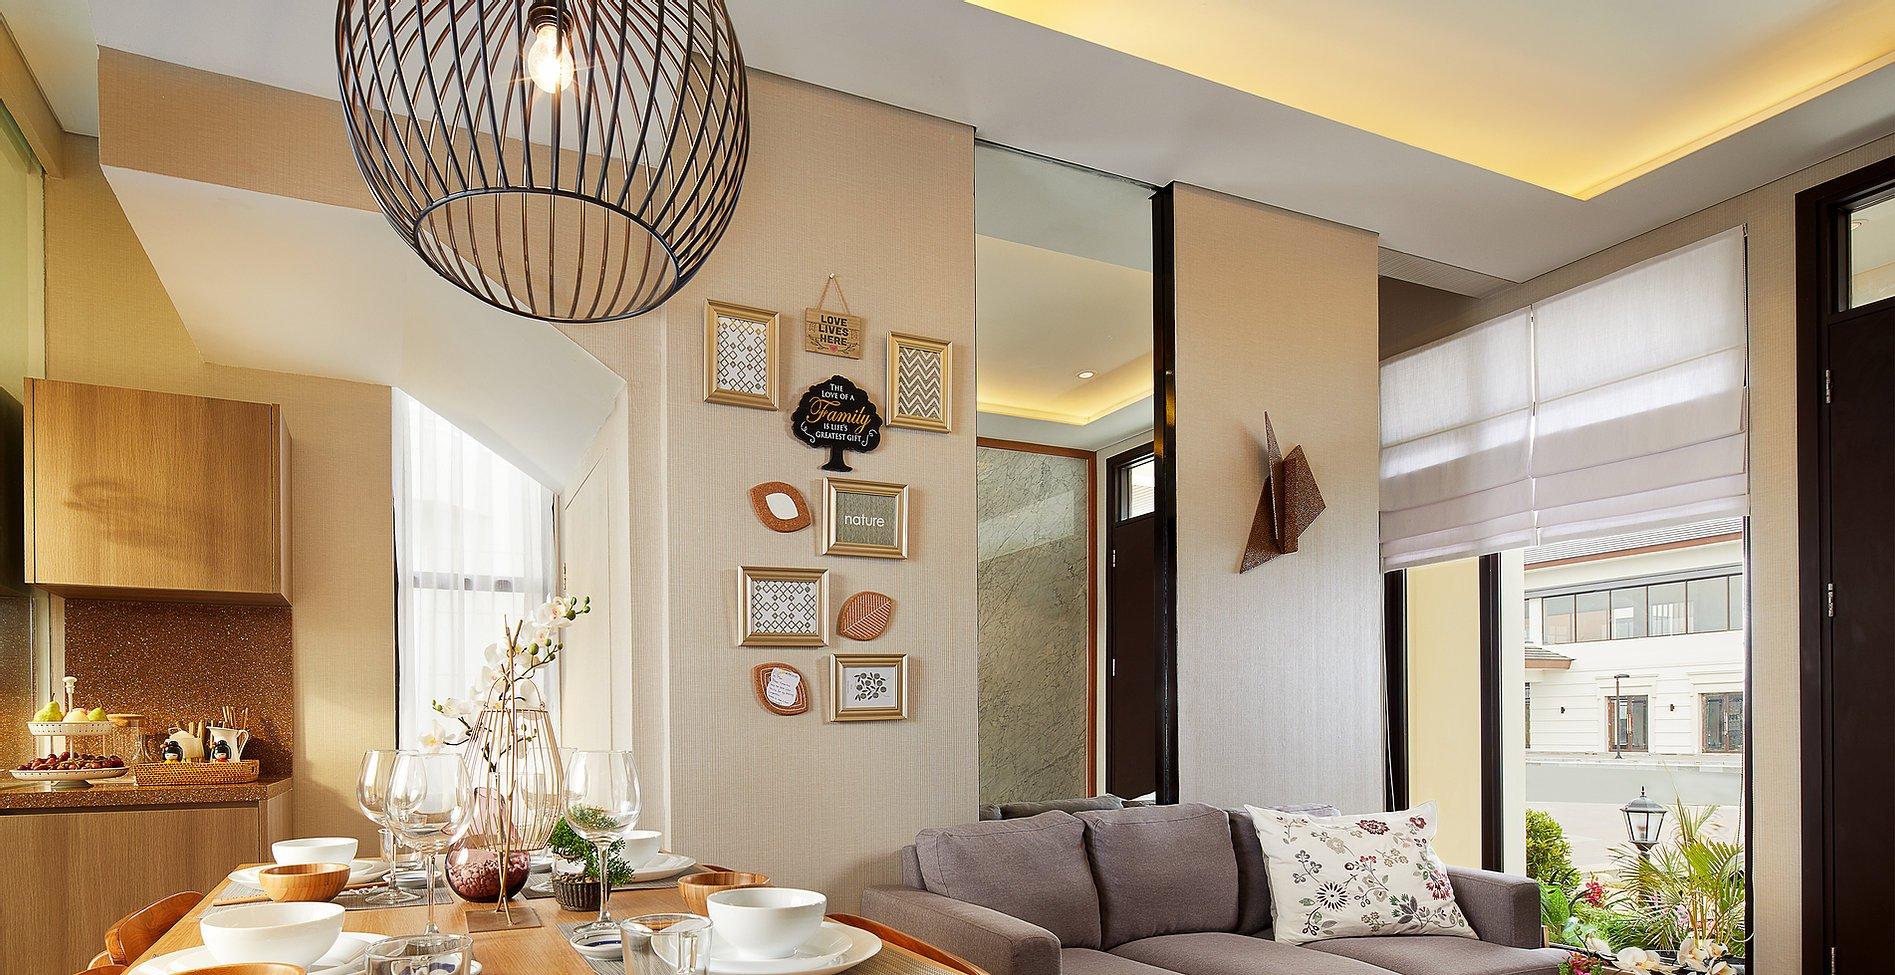 Lavon Swan City tipe C living room